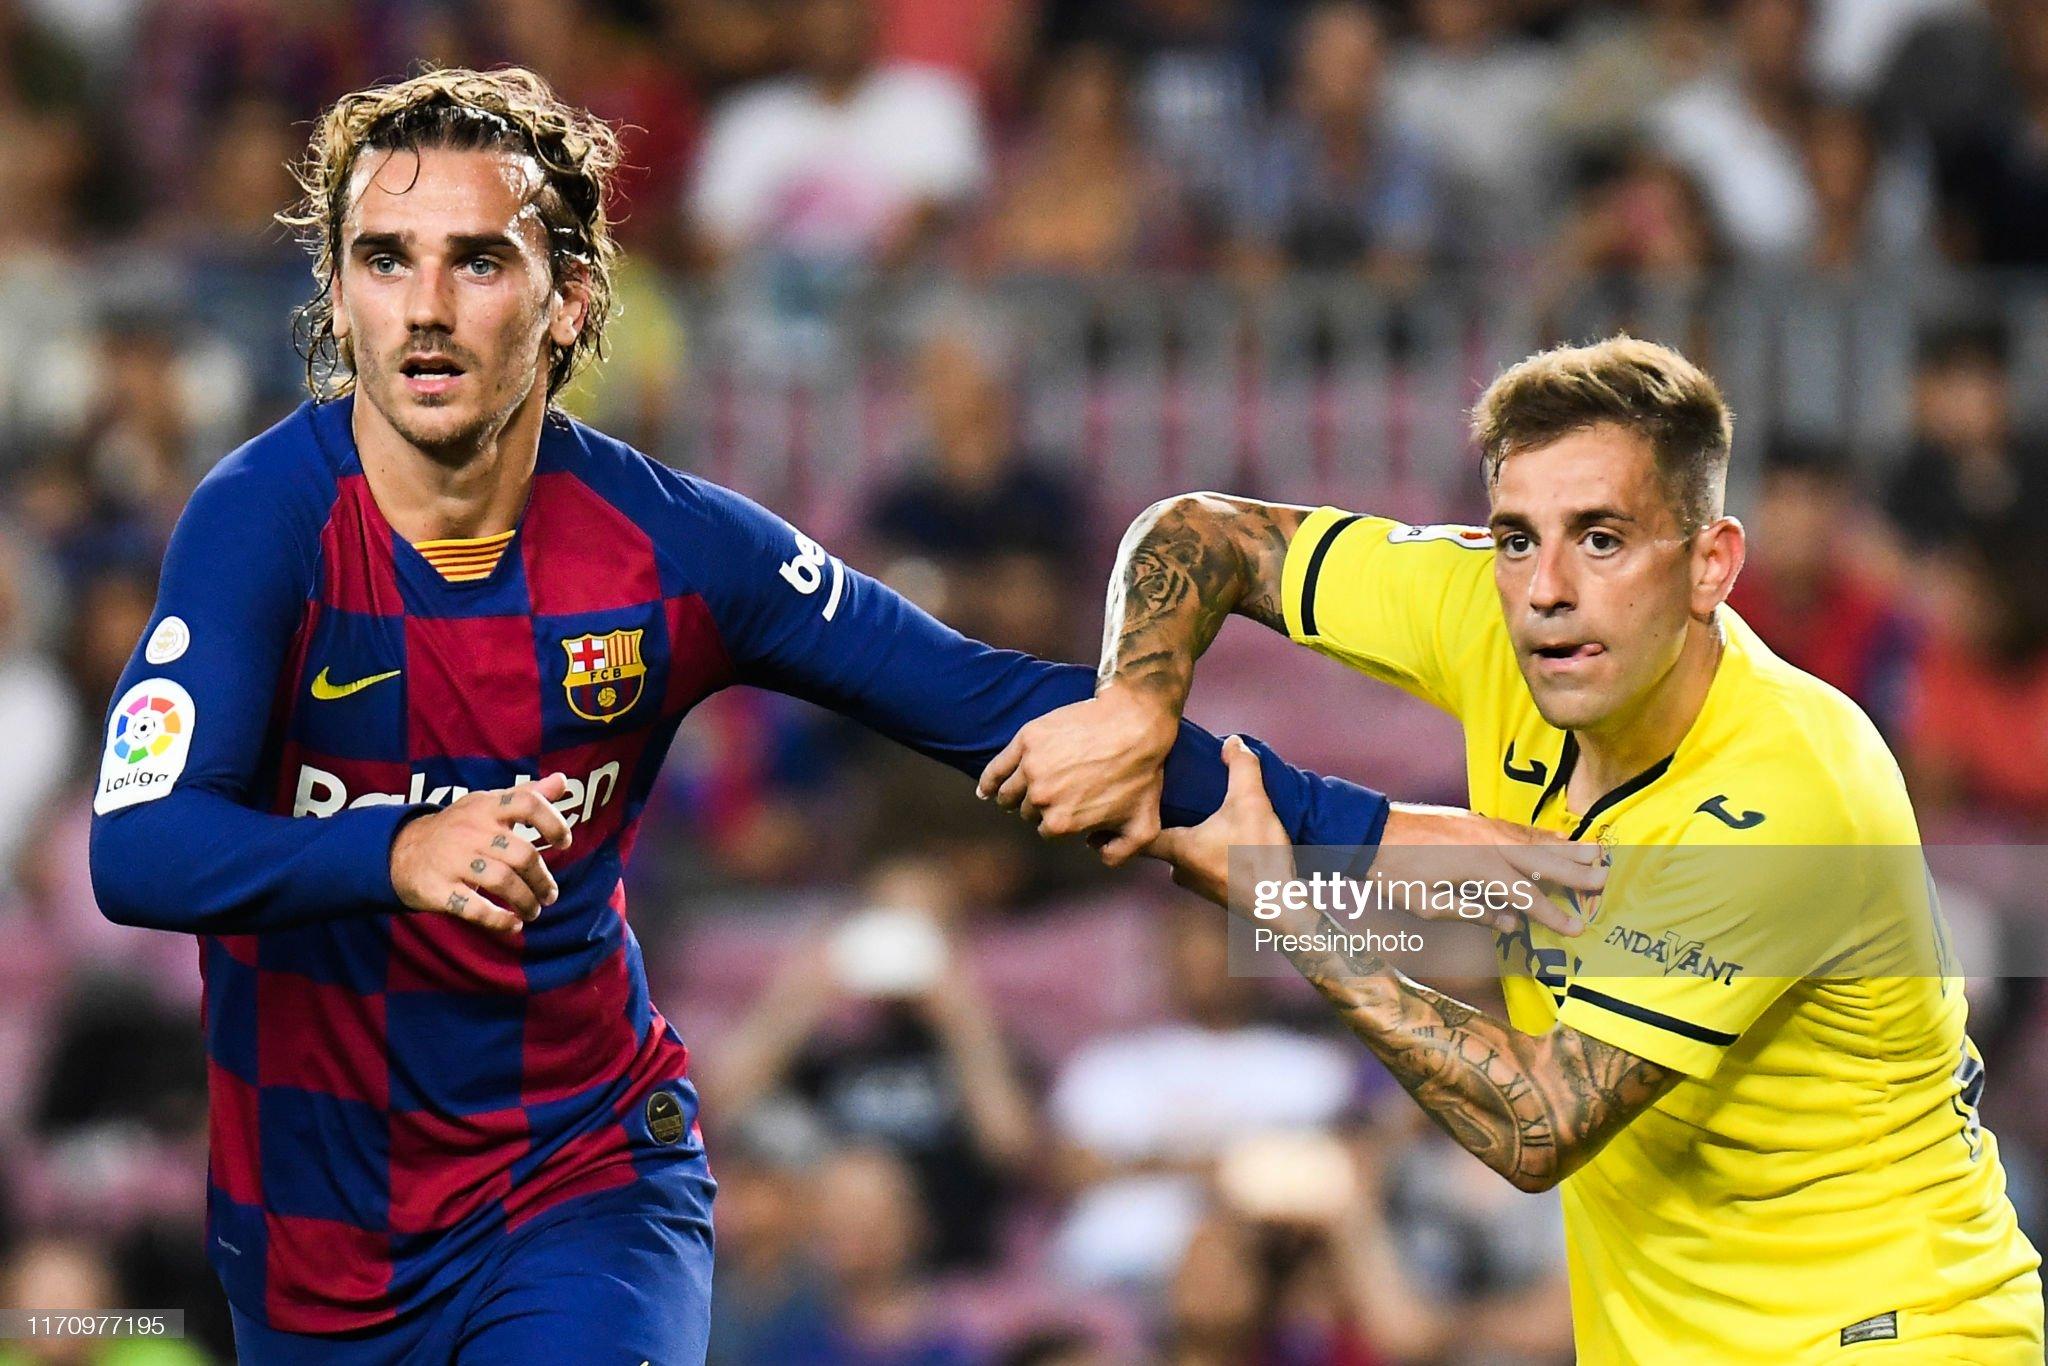 صور مباراة : برشلونة - فياريال 2-1 ( 24-09-2019 )  Antoine-griezmann-of-fc-barcelona-and-ruben-pena-of-villarreal-of-picture-id1170977195?s=2048x2048